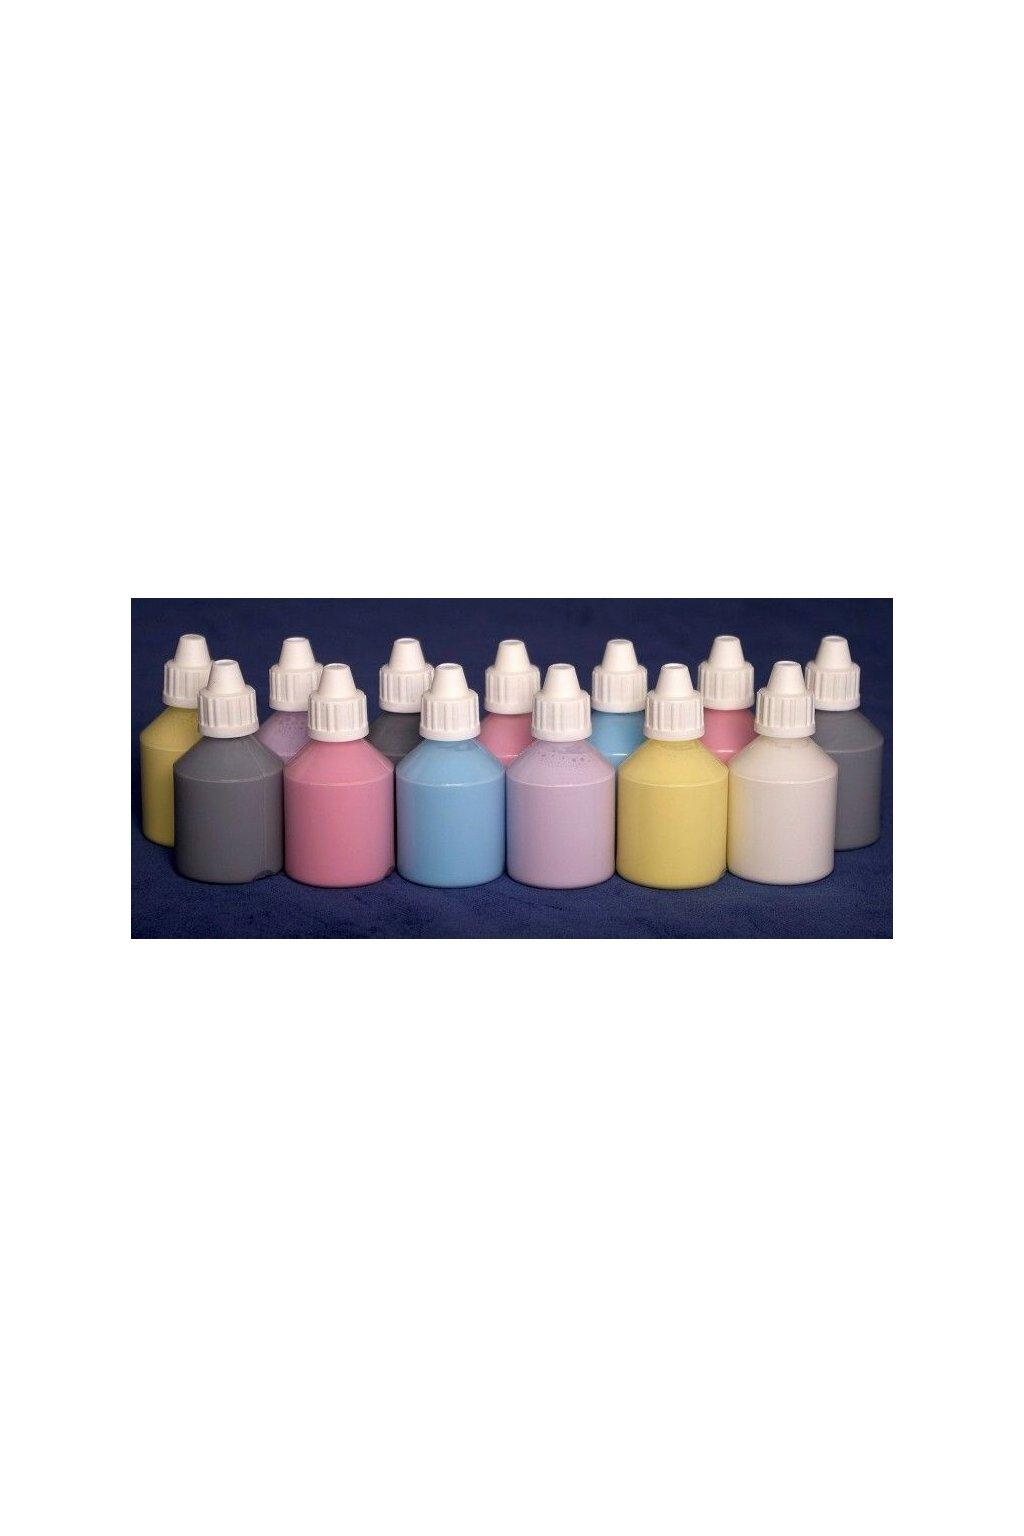 Modrý tekutý latex 25 ml